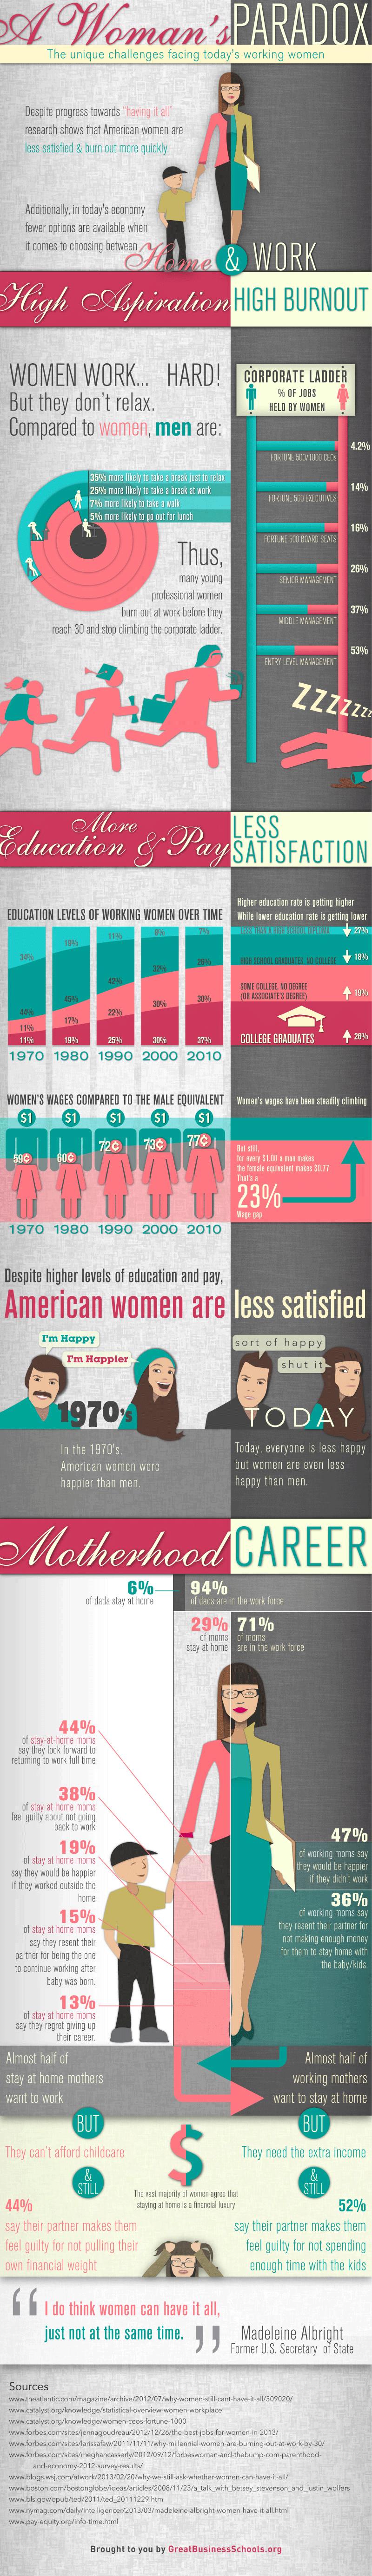 Femmes : vie pro et vie perso, ça tiraille toujours… #infographie